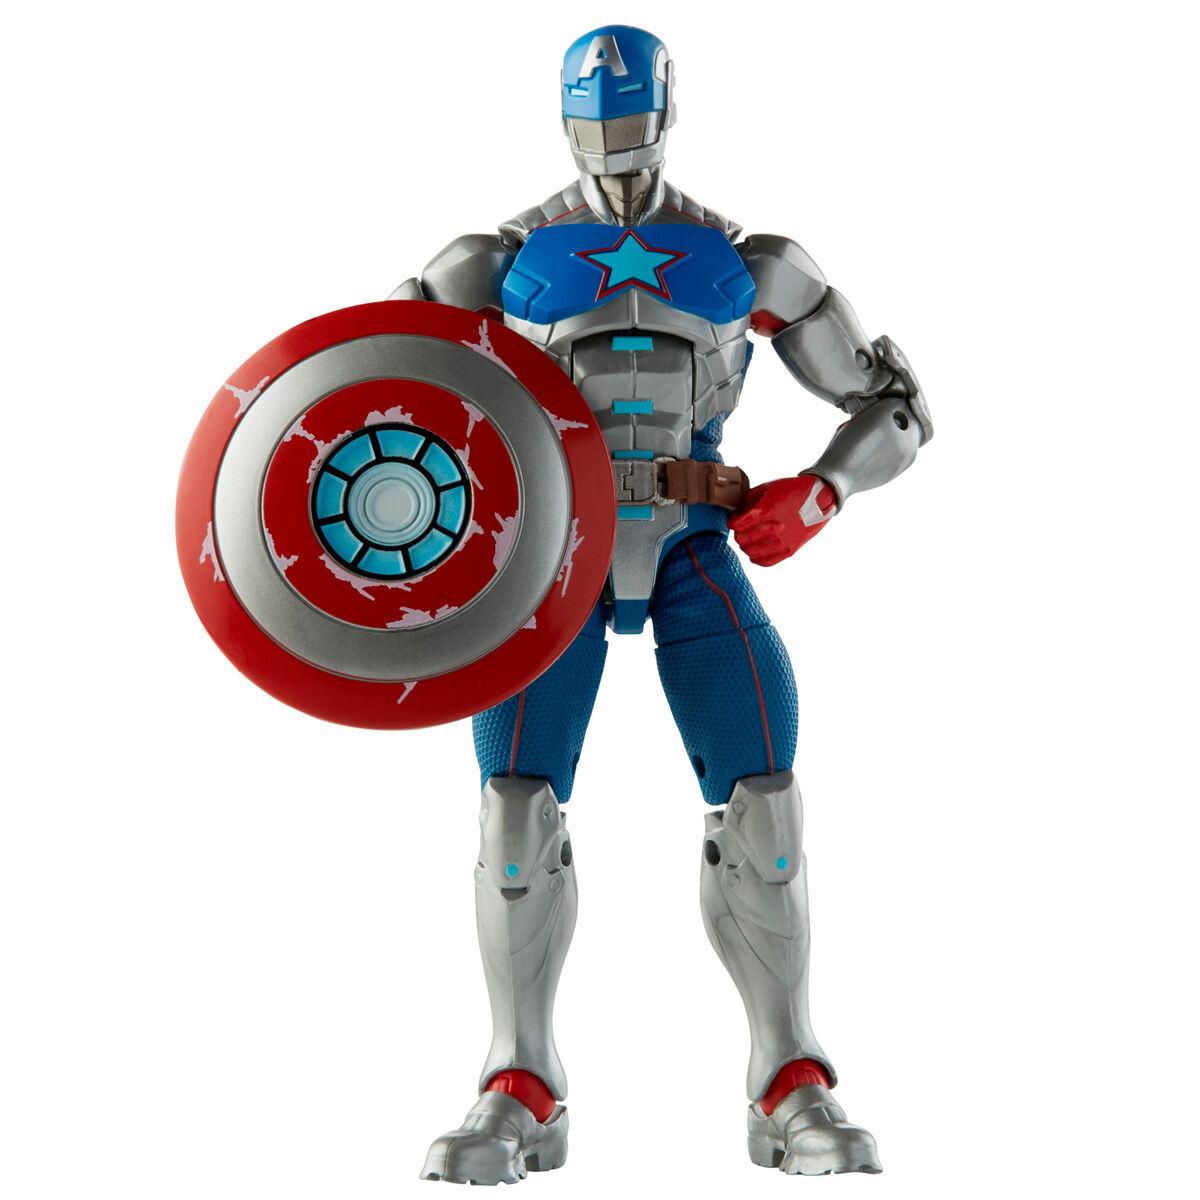 Figura Civil Warrior Contest of Champions Marvel 15cm 5010993786527